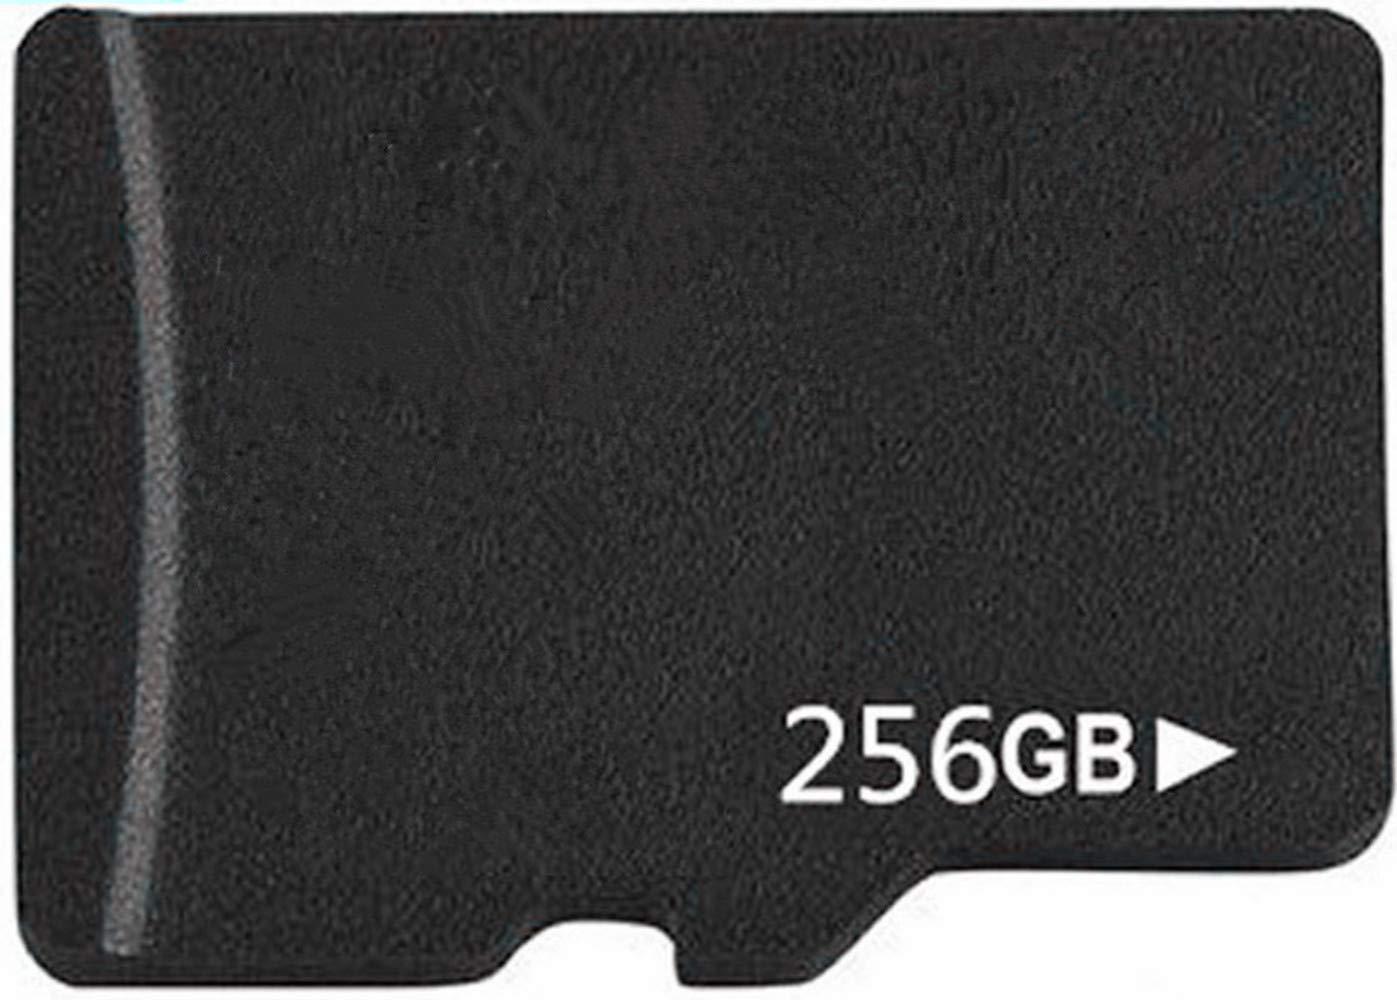 Karenon Tarjeta Micro SD 256 GB, microSDXC 256 GB Class 10 Tarjeta de Memoria + Adaptador (FT135-KY1) (256GB)